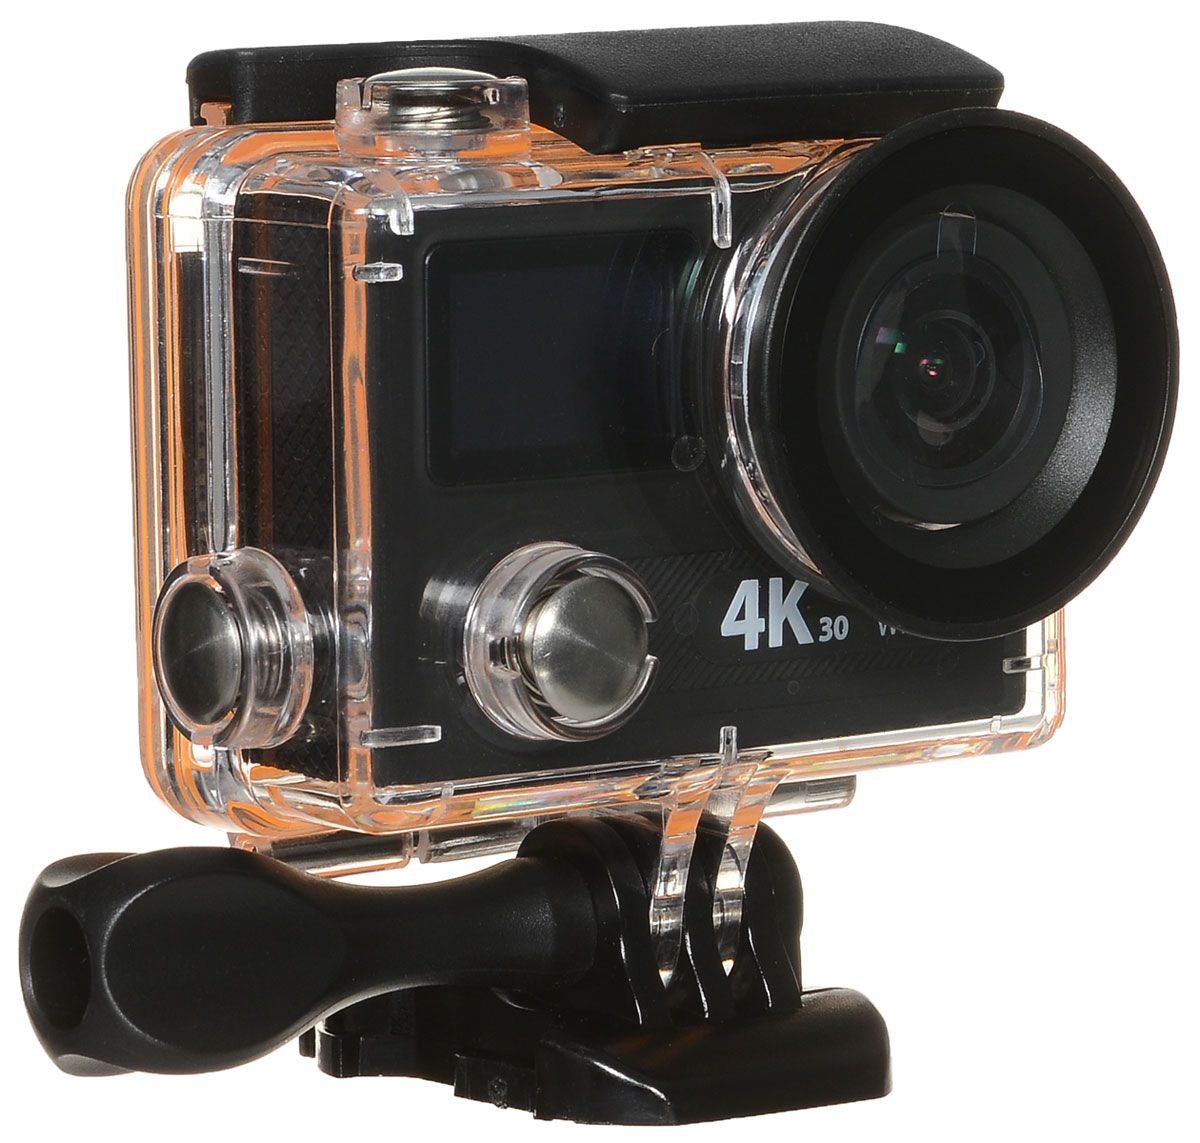 Eken H8 Ultra HD, Black экшн-камера - Цифровые видеокамеры